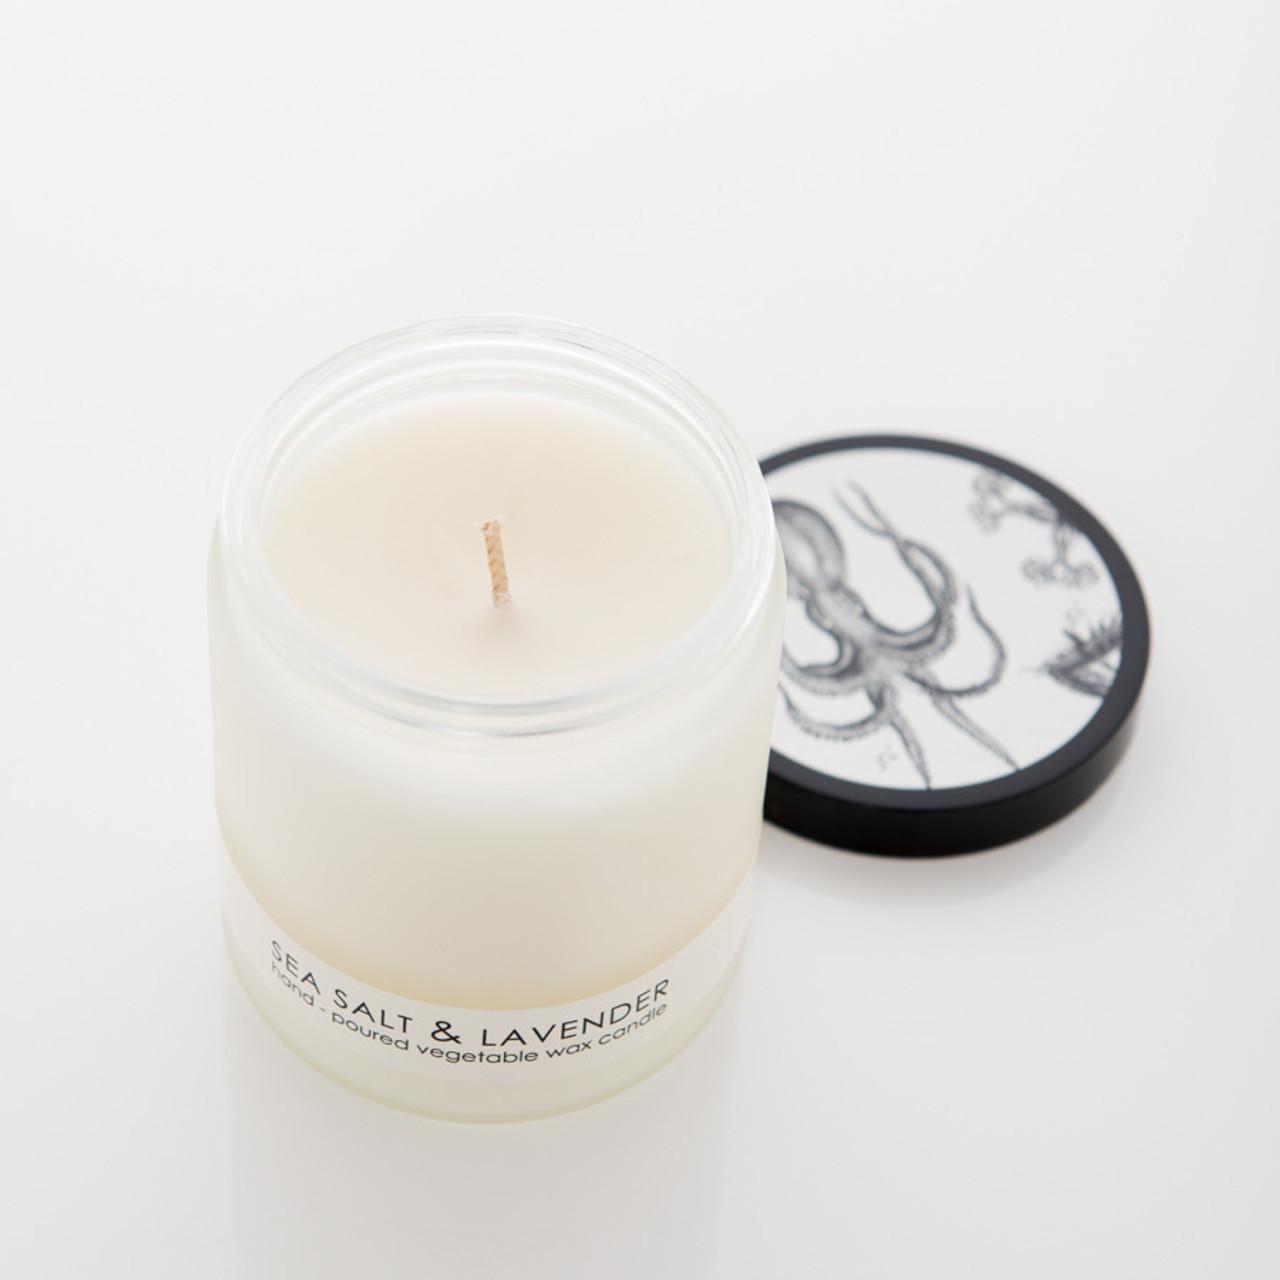 Sea Salt and Lavender Candle